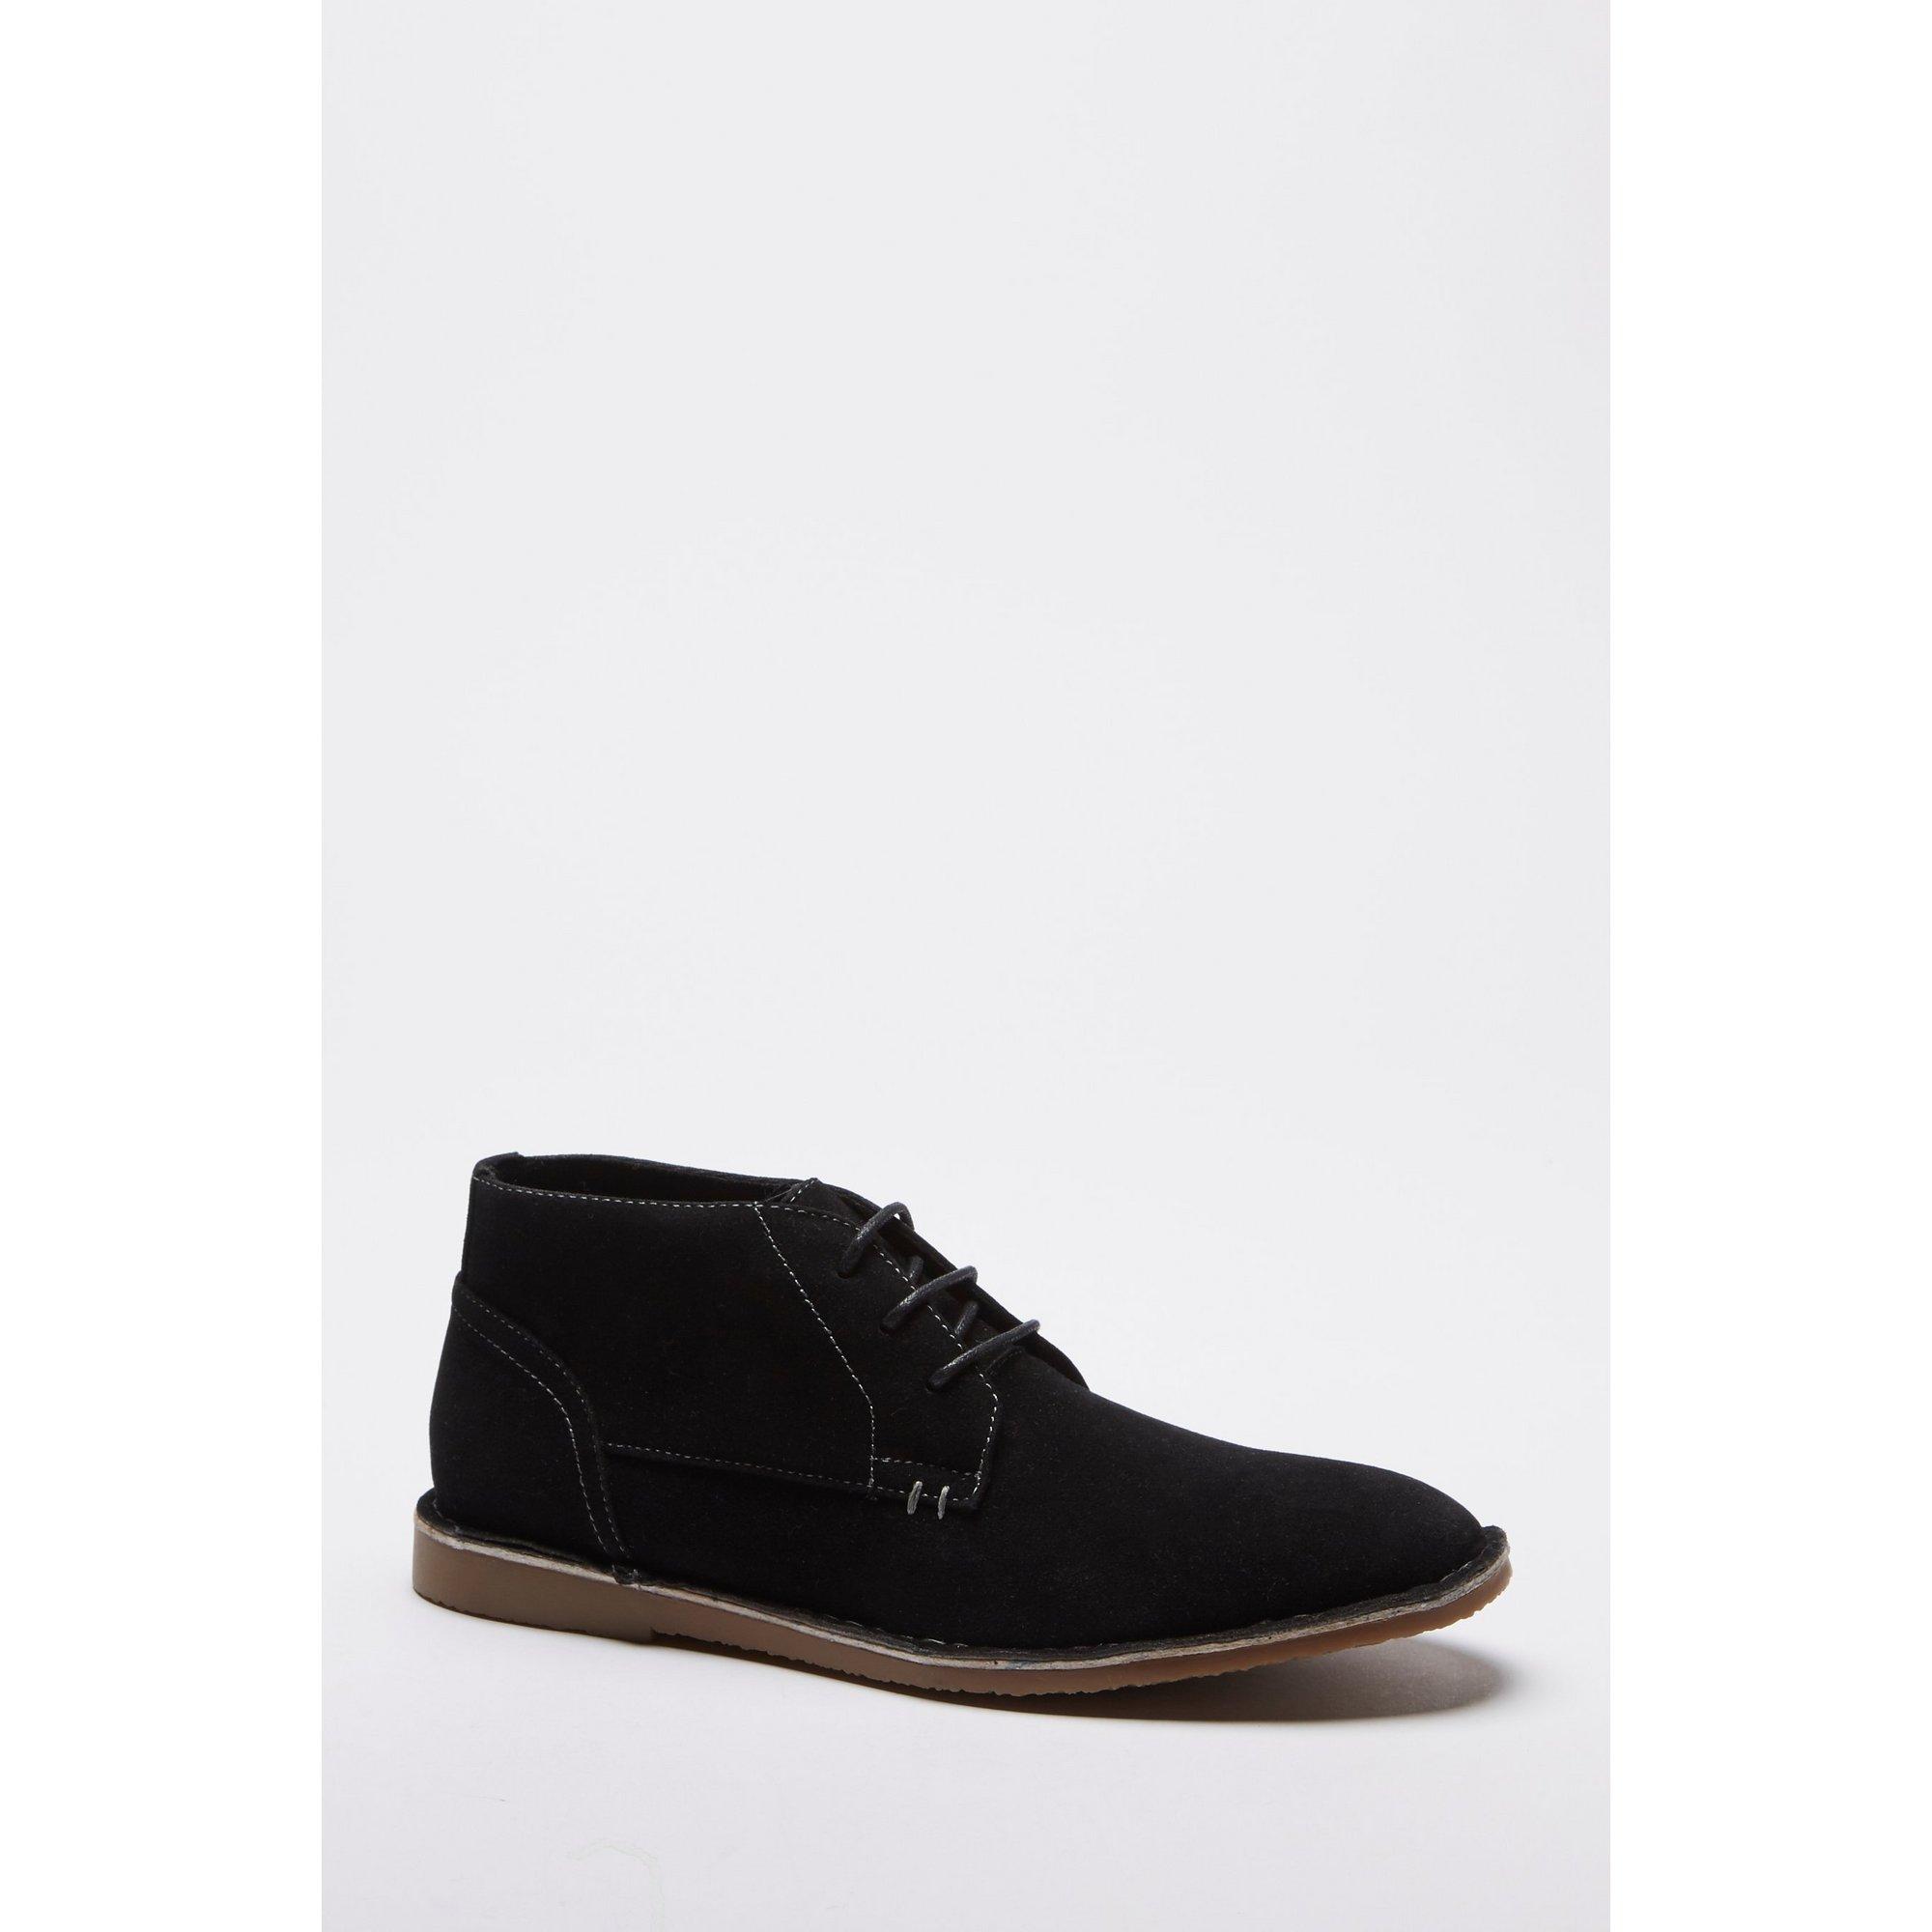 Image of Chukka Boots